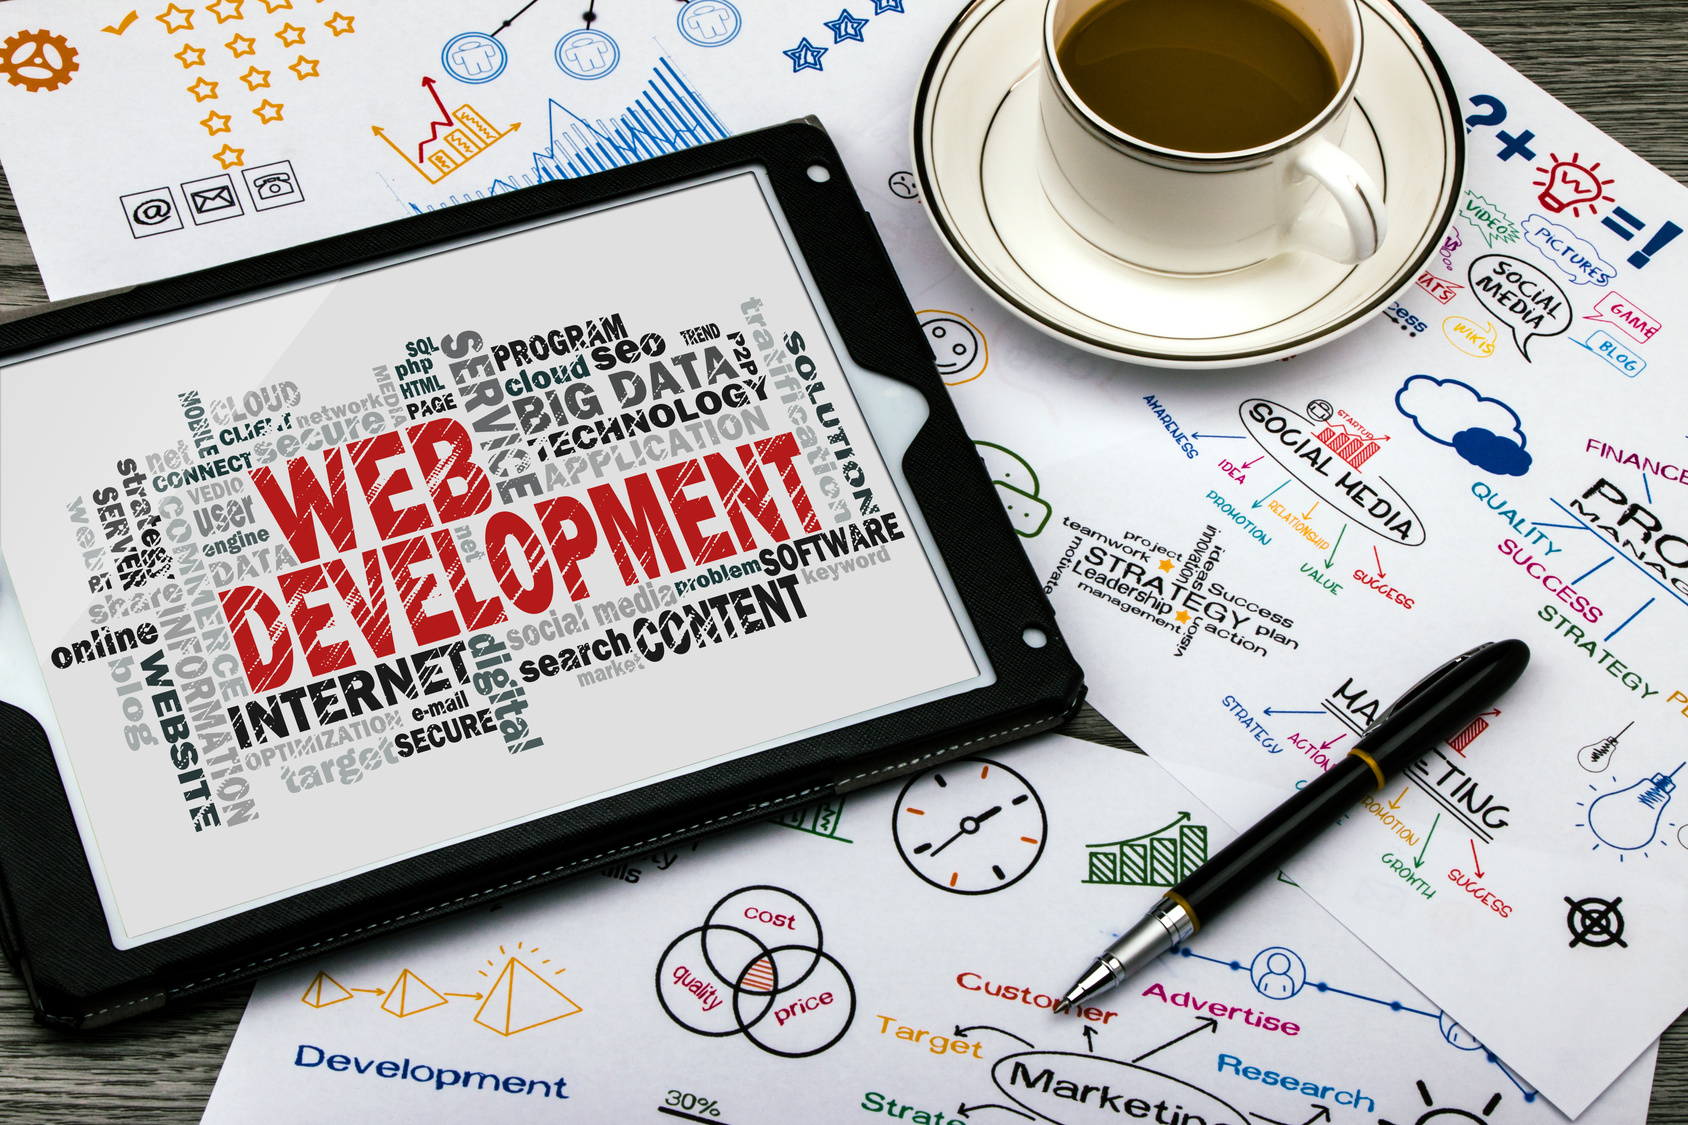 Développement web, Webdesign